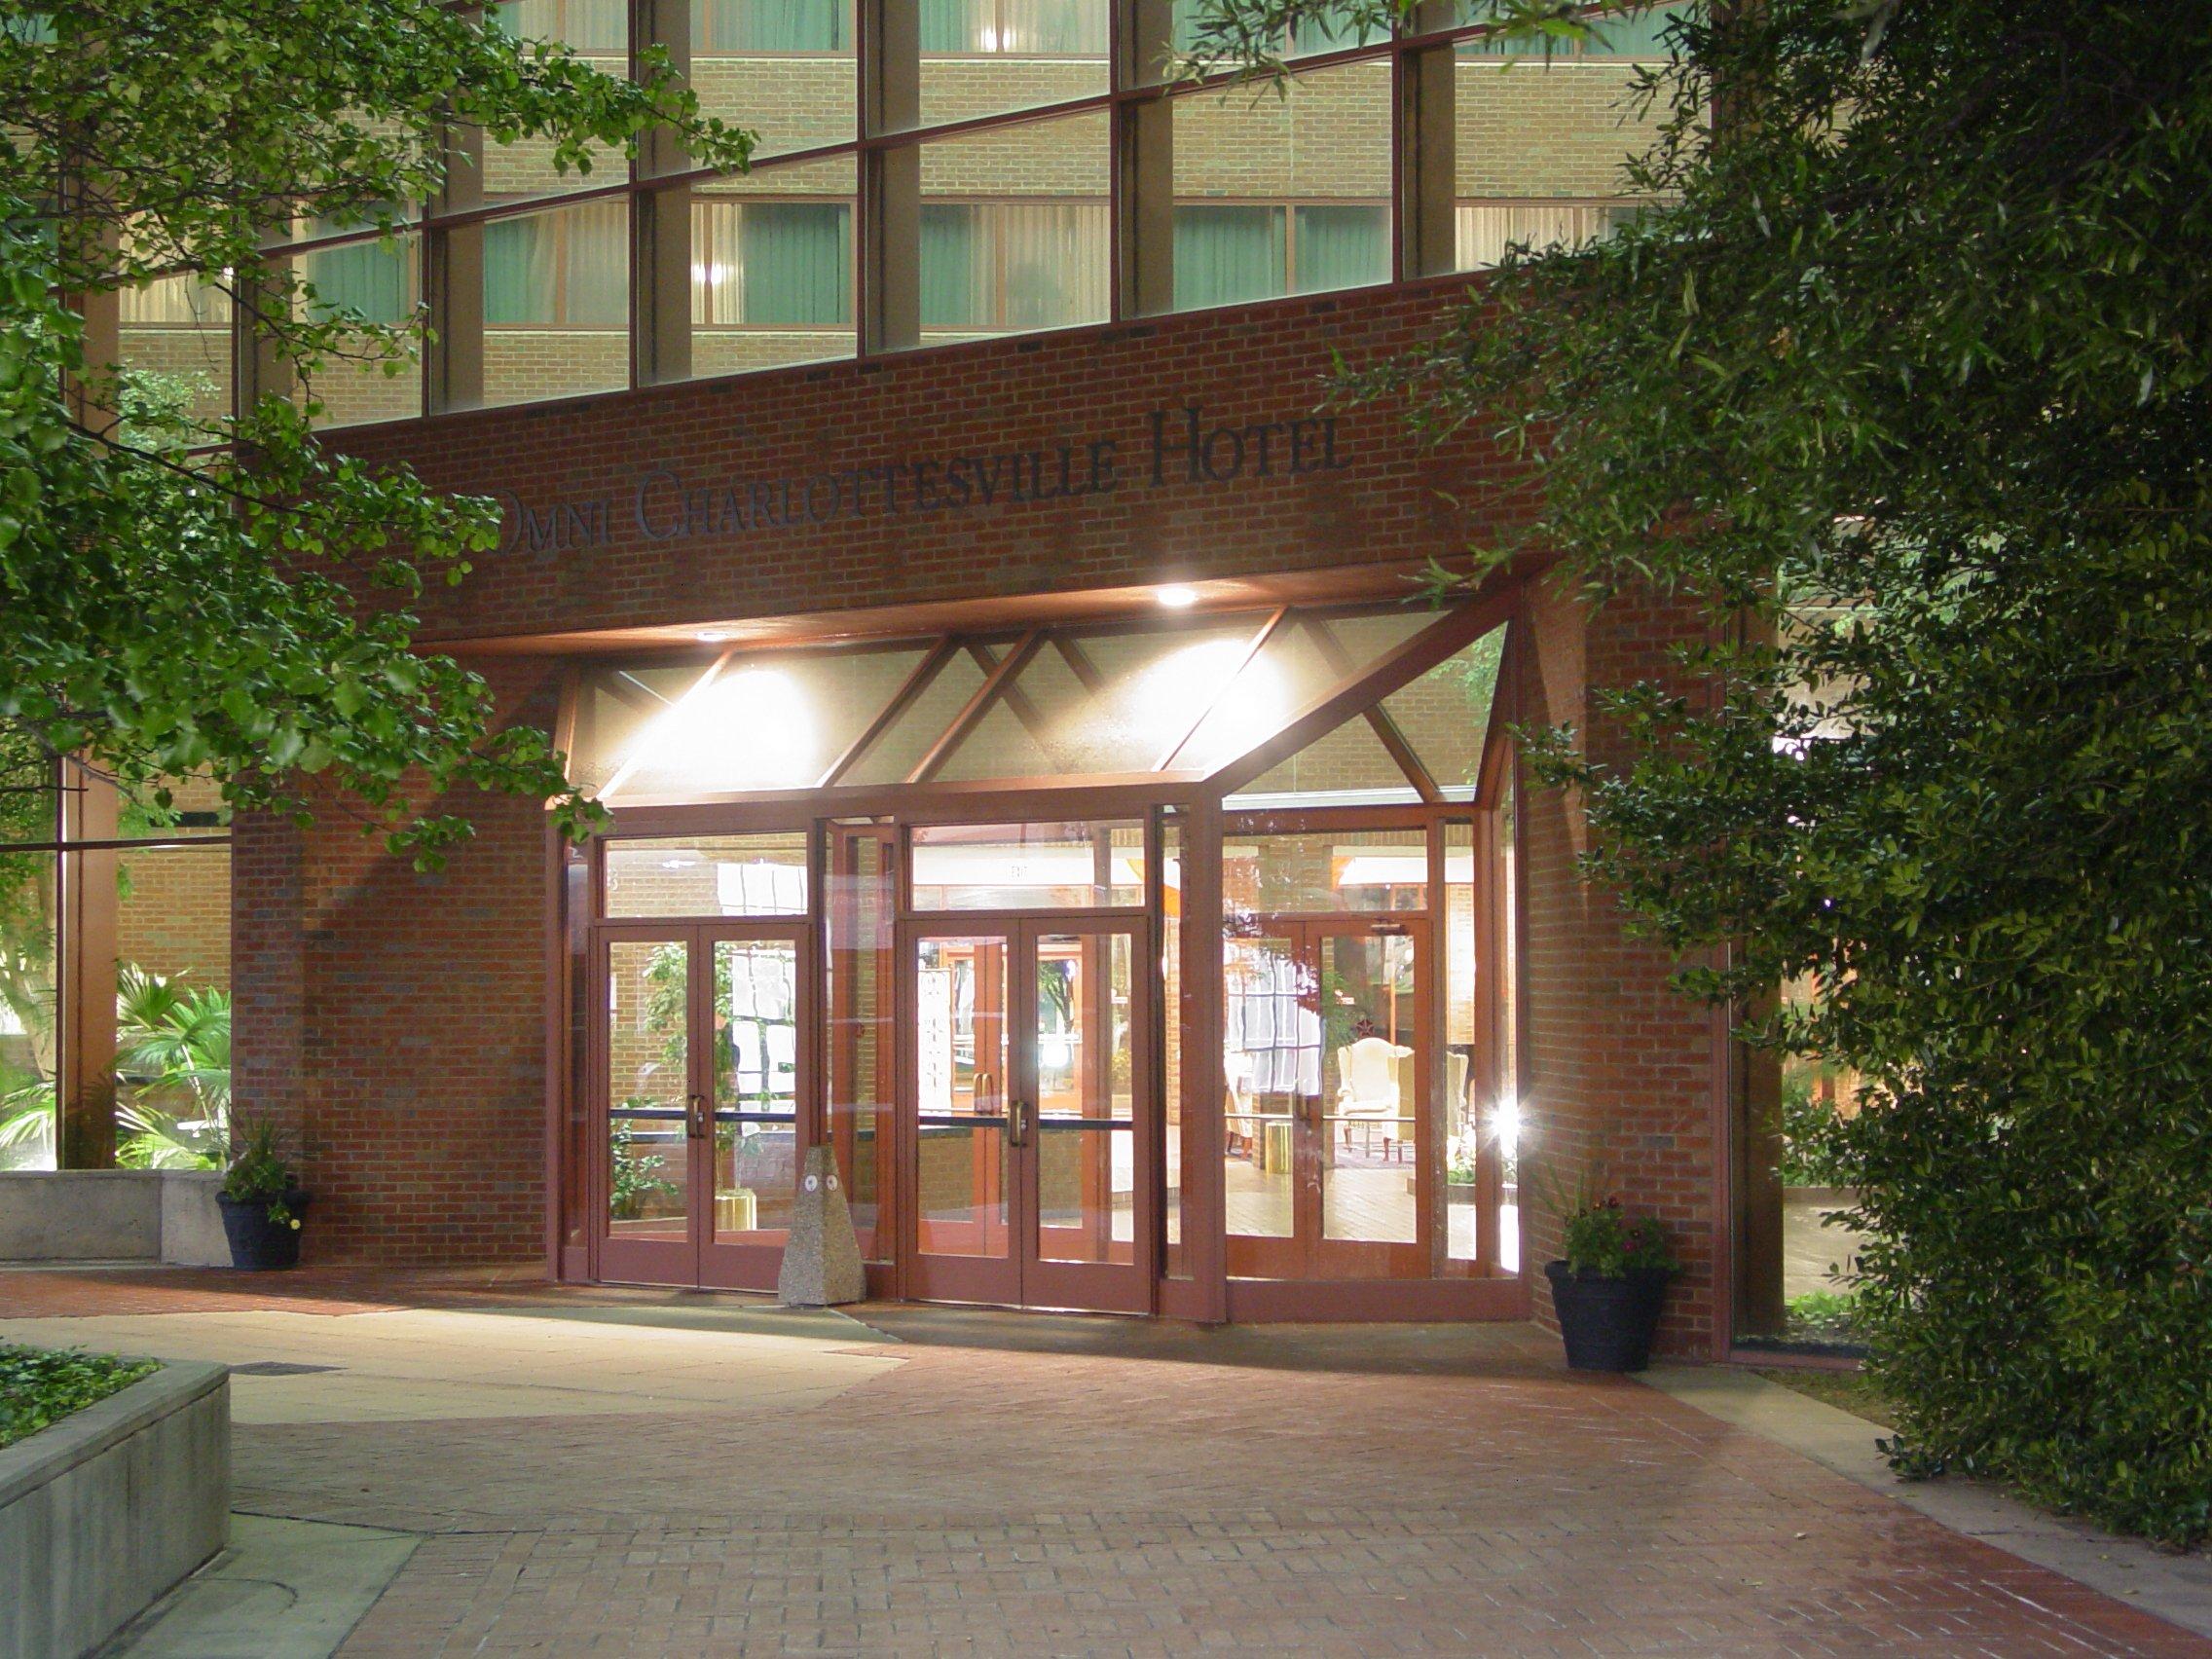 File Omni Charlottesville Hotel Entrance Jpg